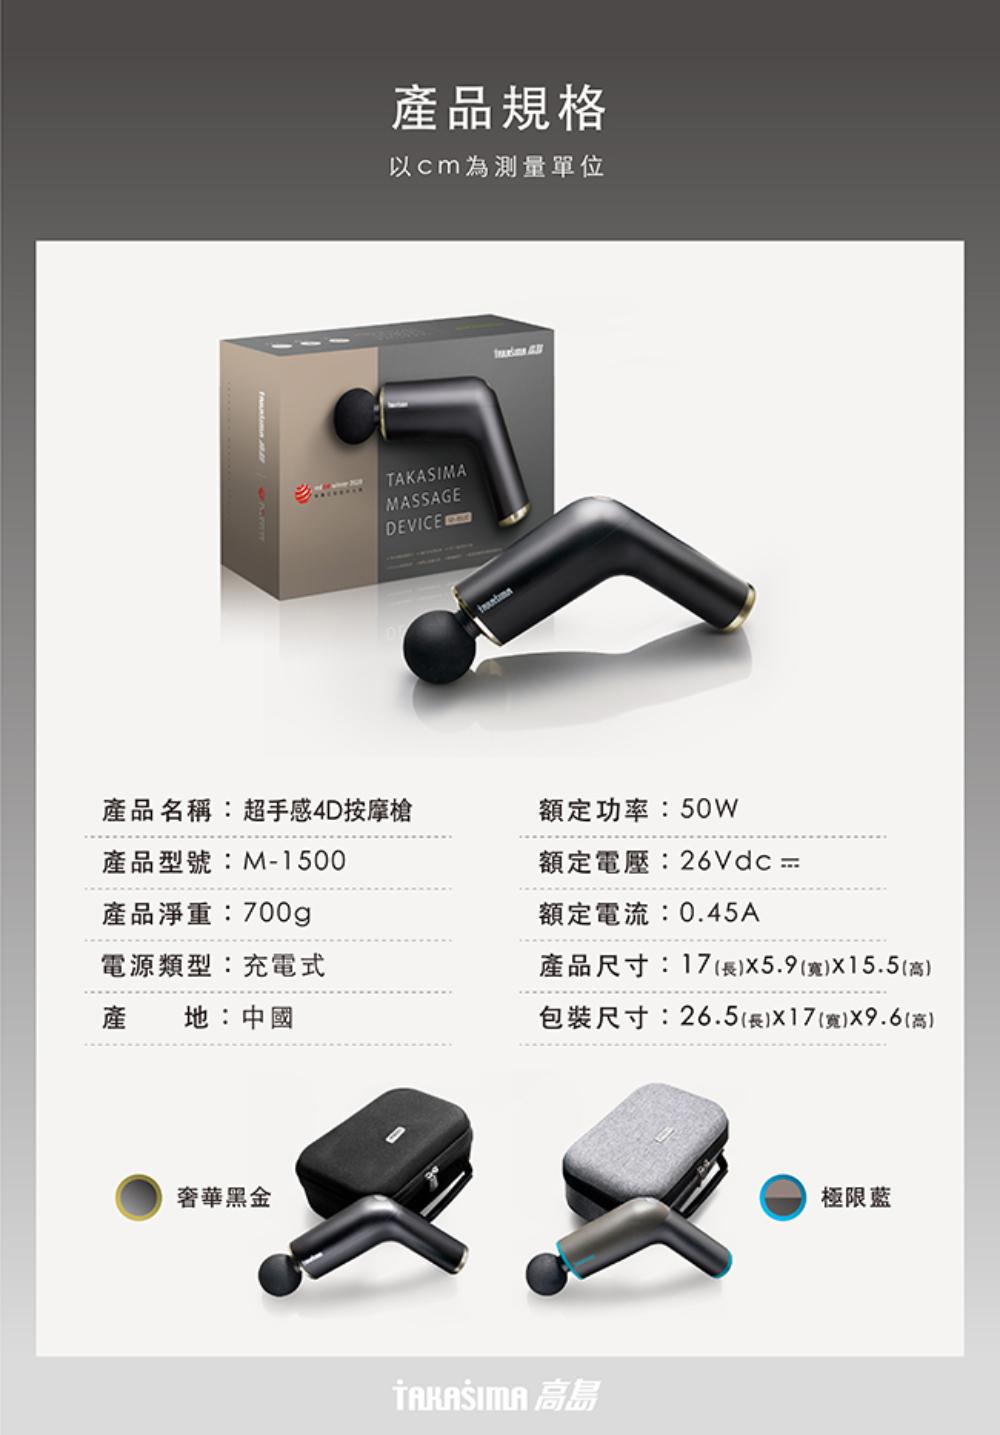 TAKASIMA-高島-超手感4D按摩槍-規格